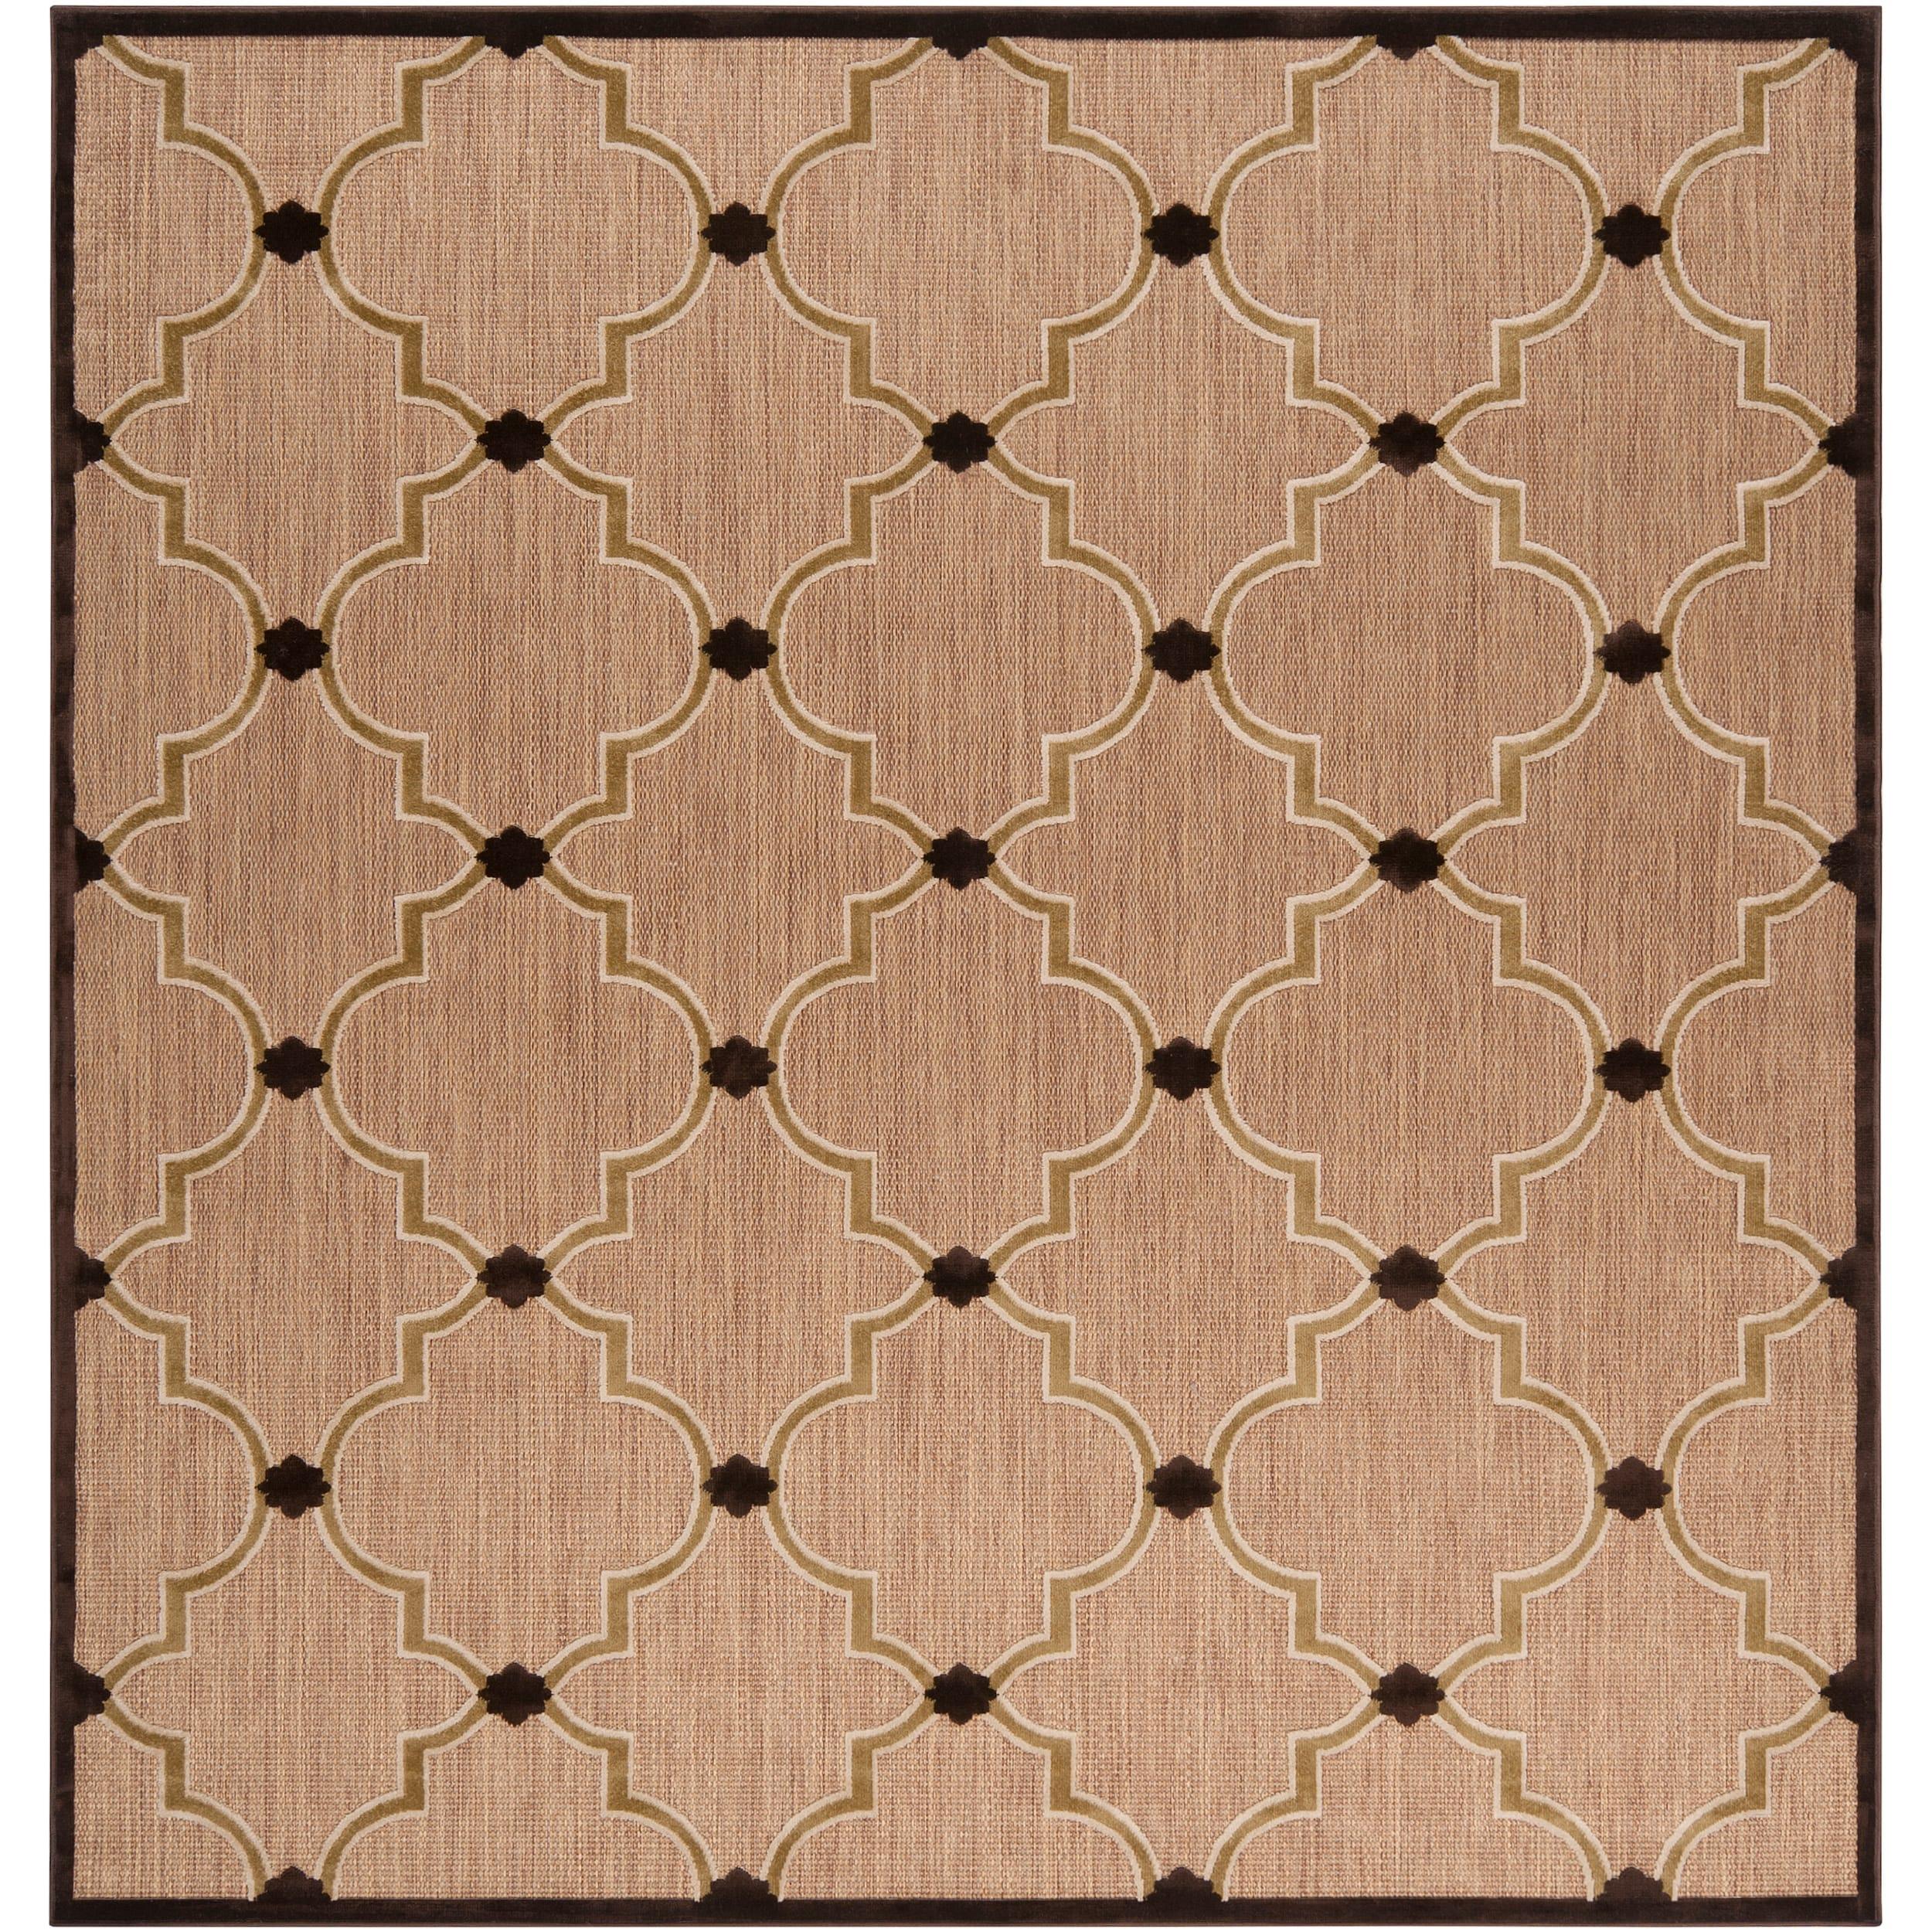 Woven Tan Cladagh Indoor Outdoor Moroccan Geometric